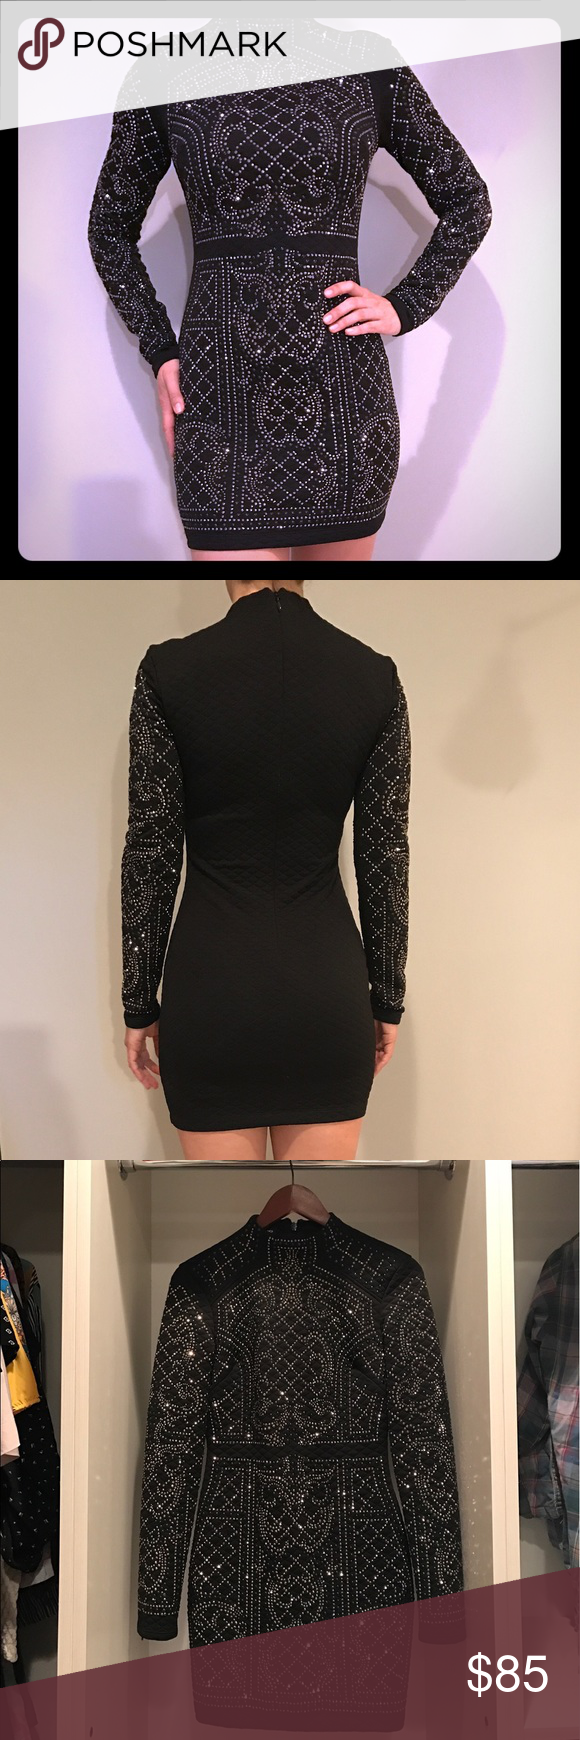 Bebe dress black sleeve and keys